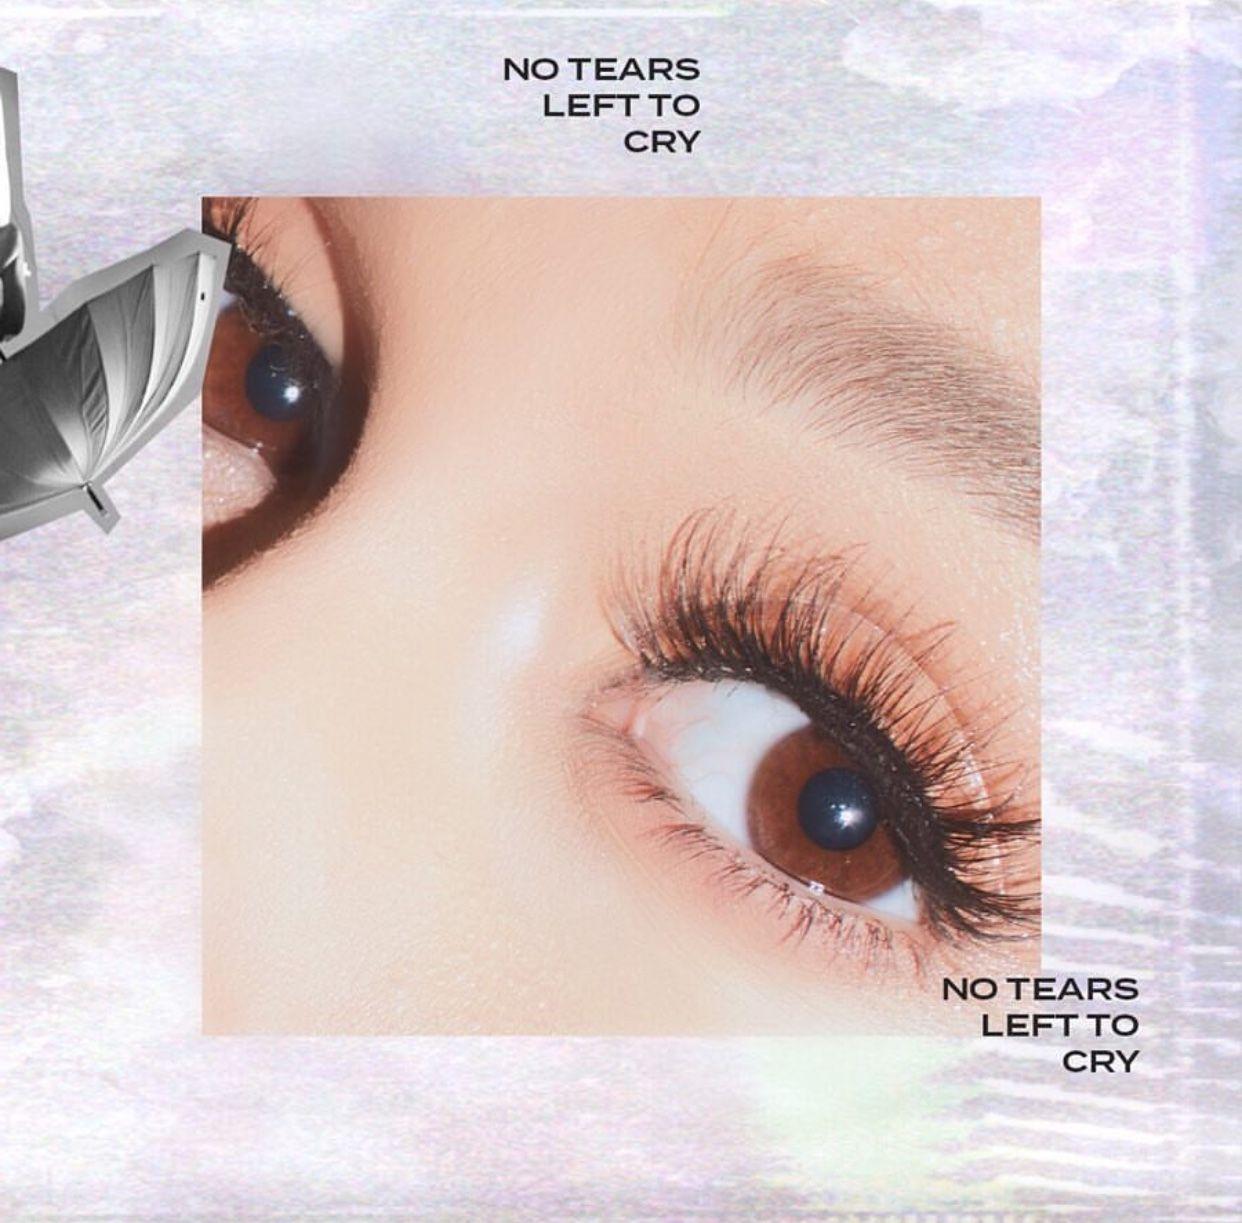 P I N T E R E S T Xoteanna3 Ariana Grande News Ariana